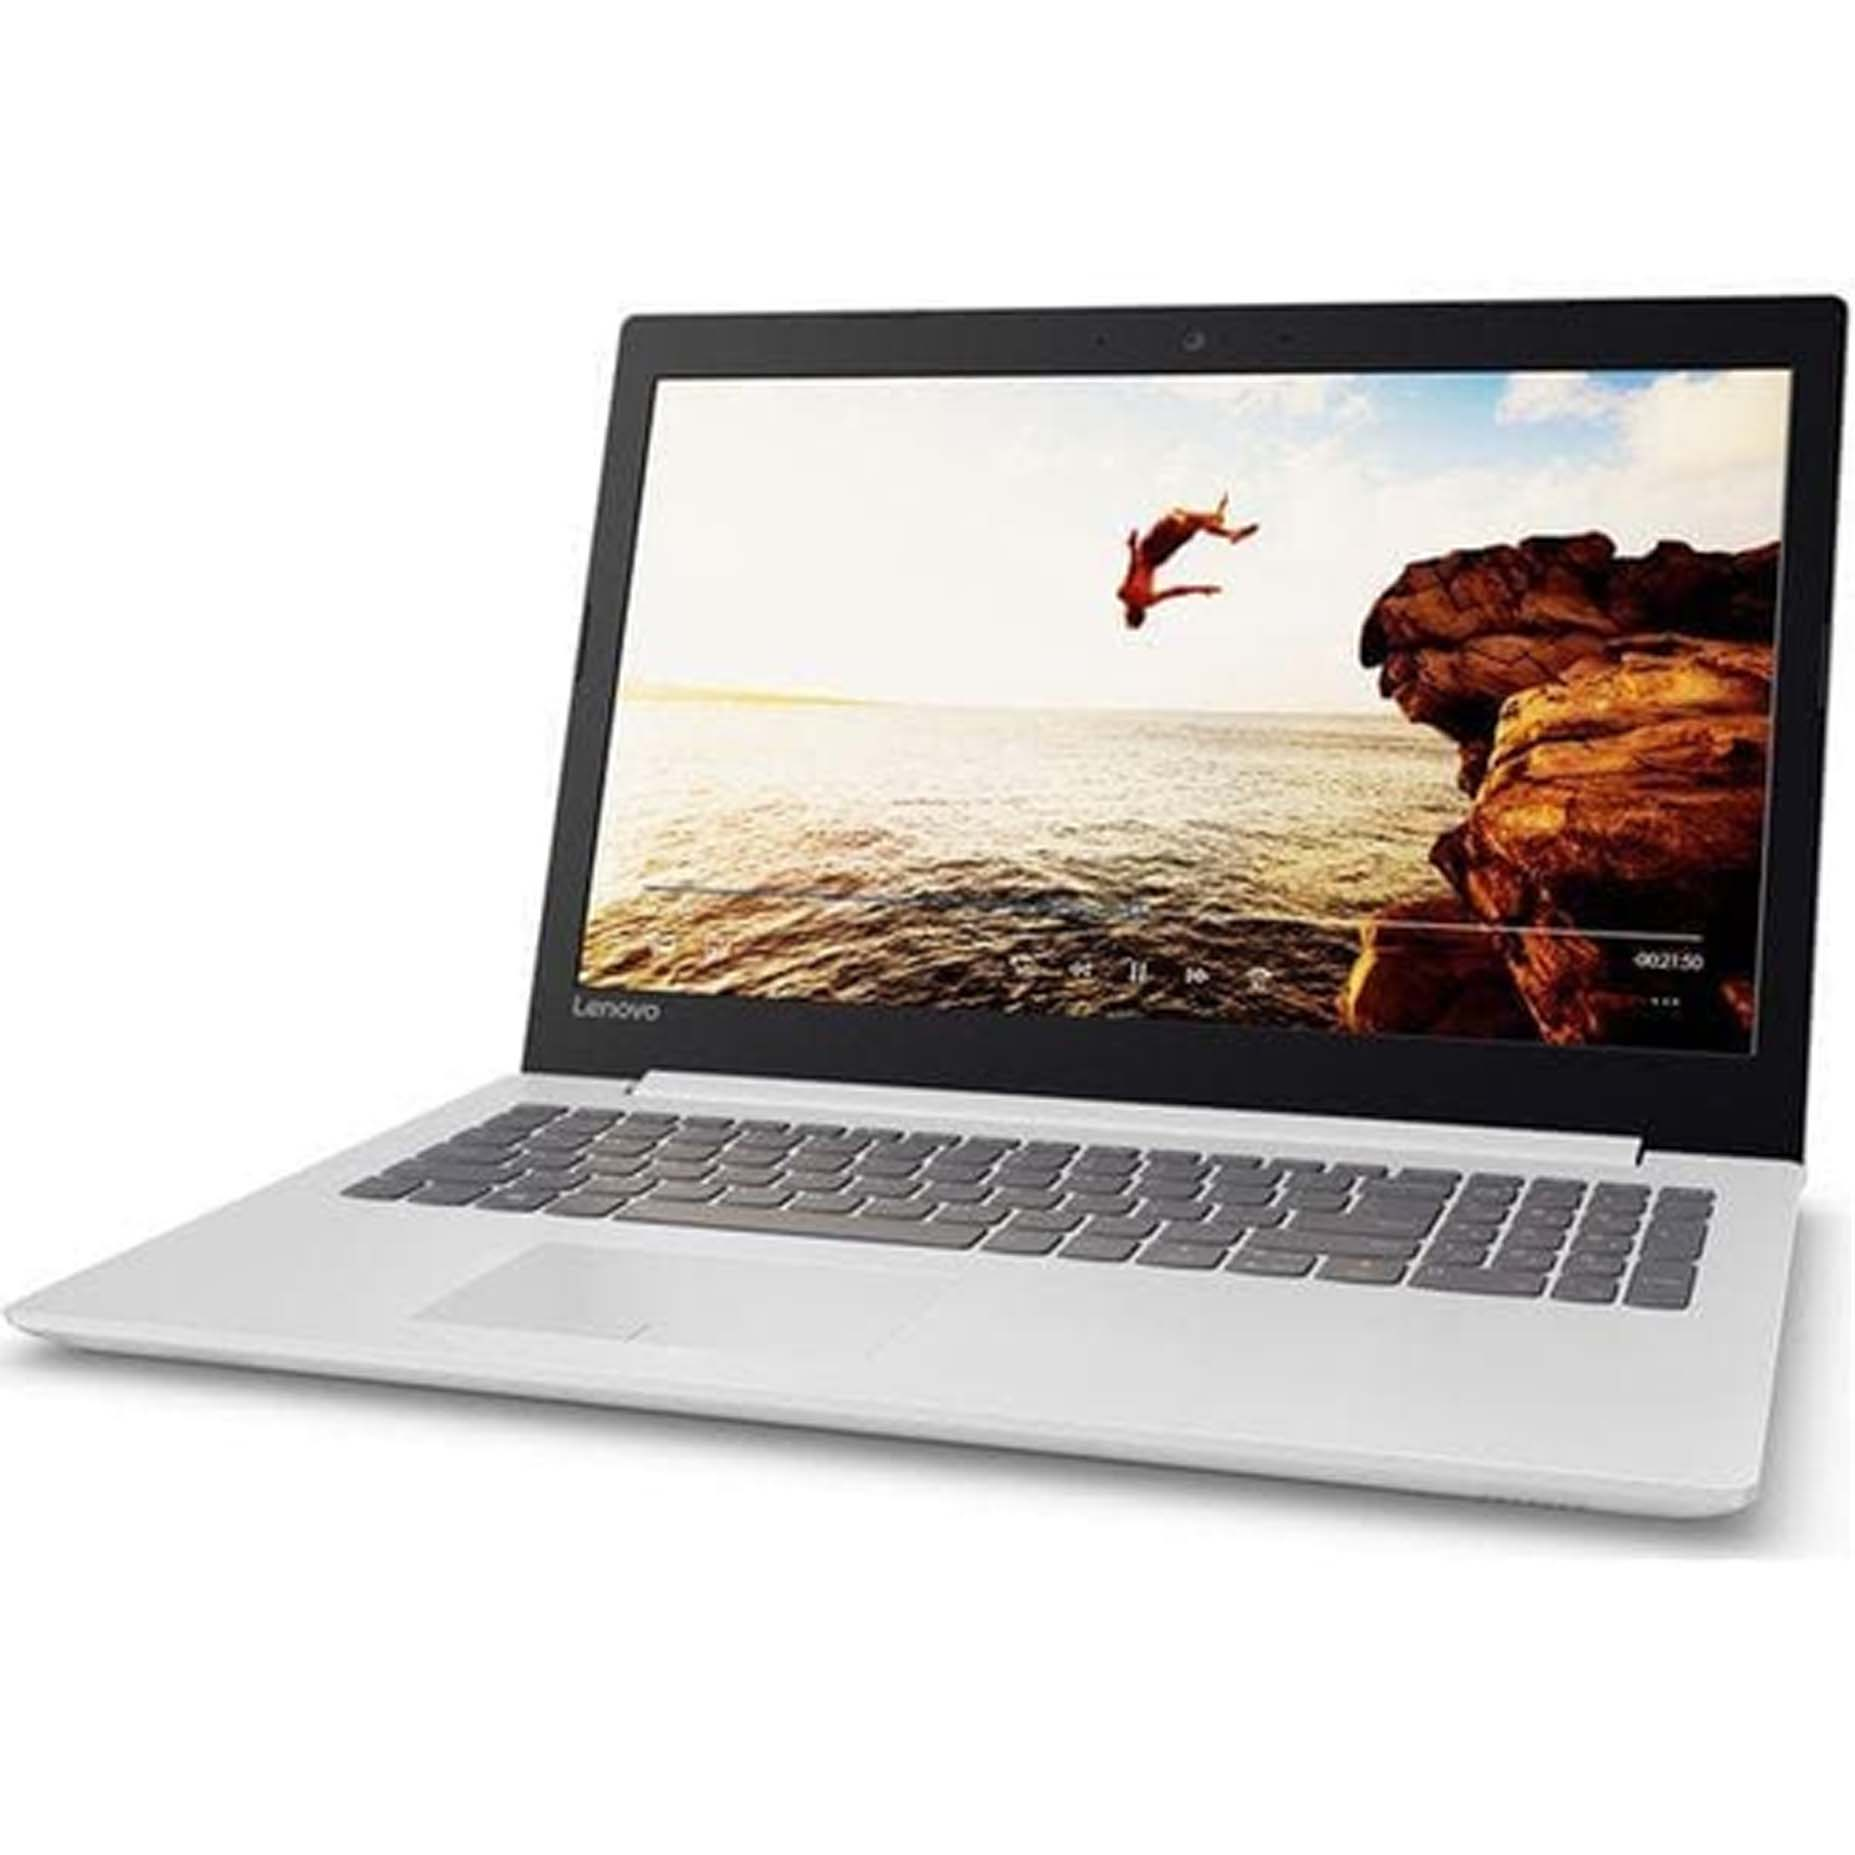 Harga Lenovo Ideapad IP320-14ISK 1CID Laptop Intel Core i3-6006U 4GB 1TB Integrated Windows 10 14 Inch White